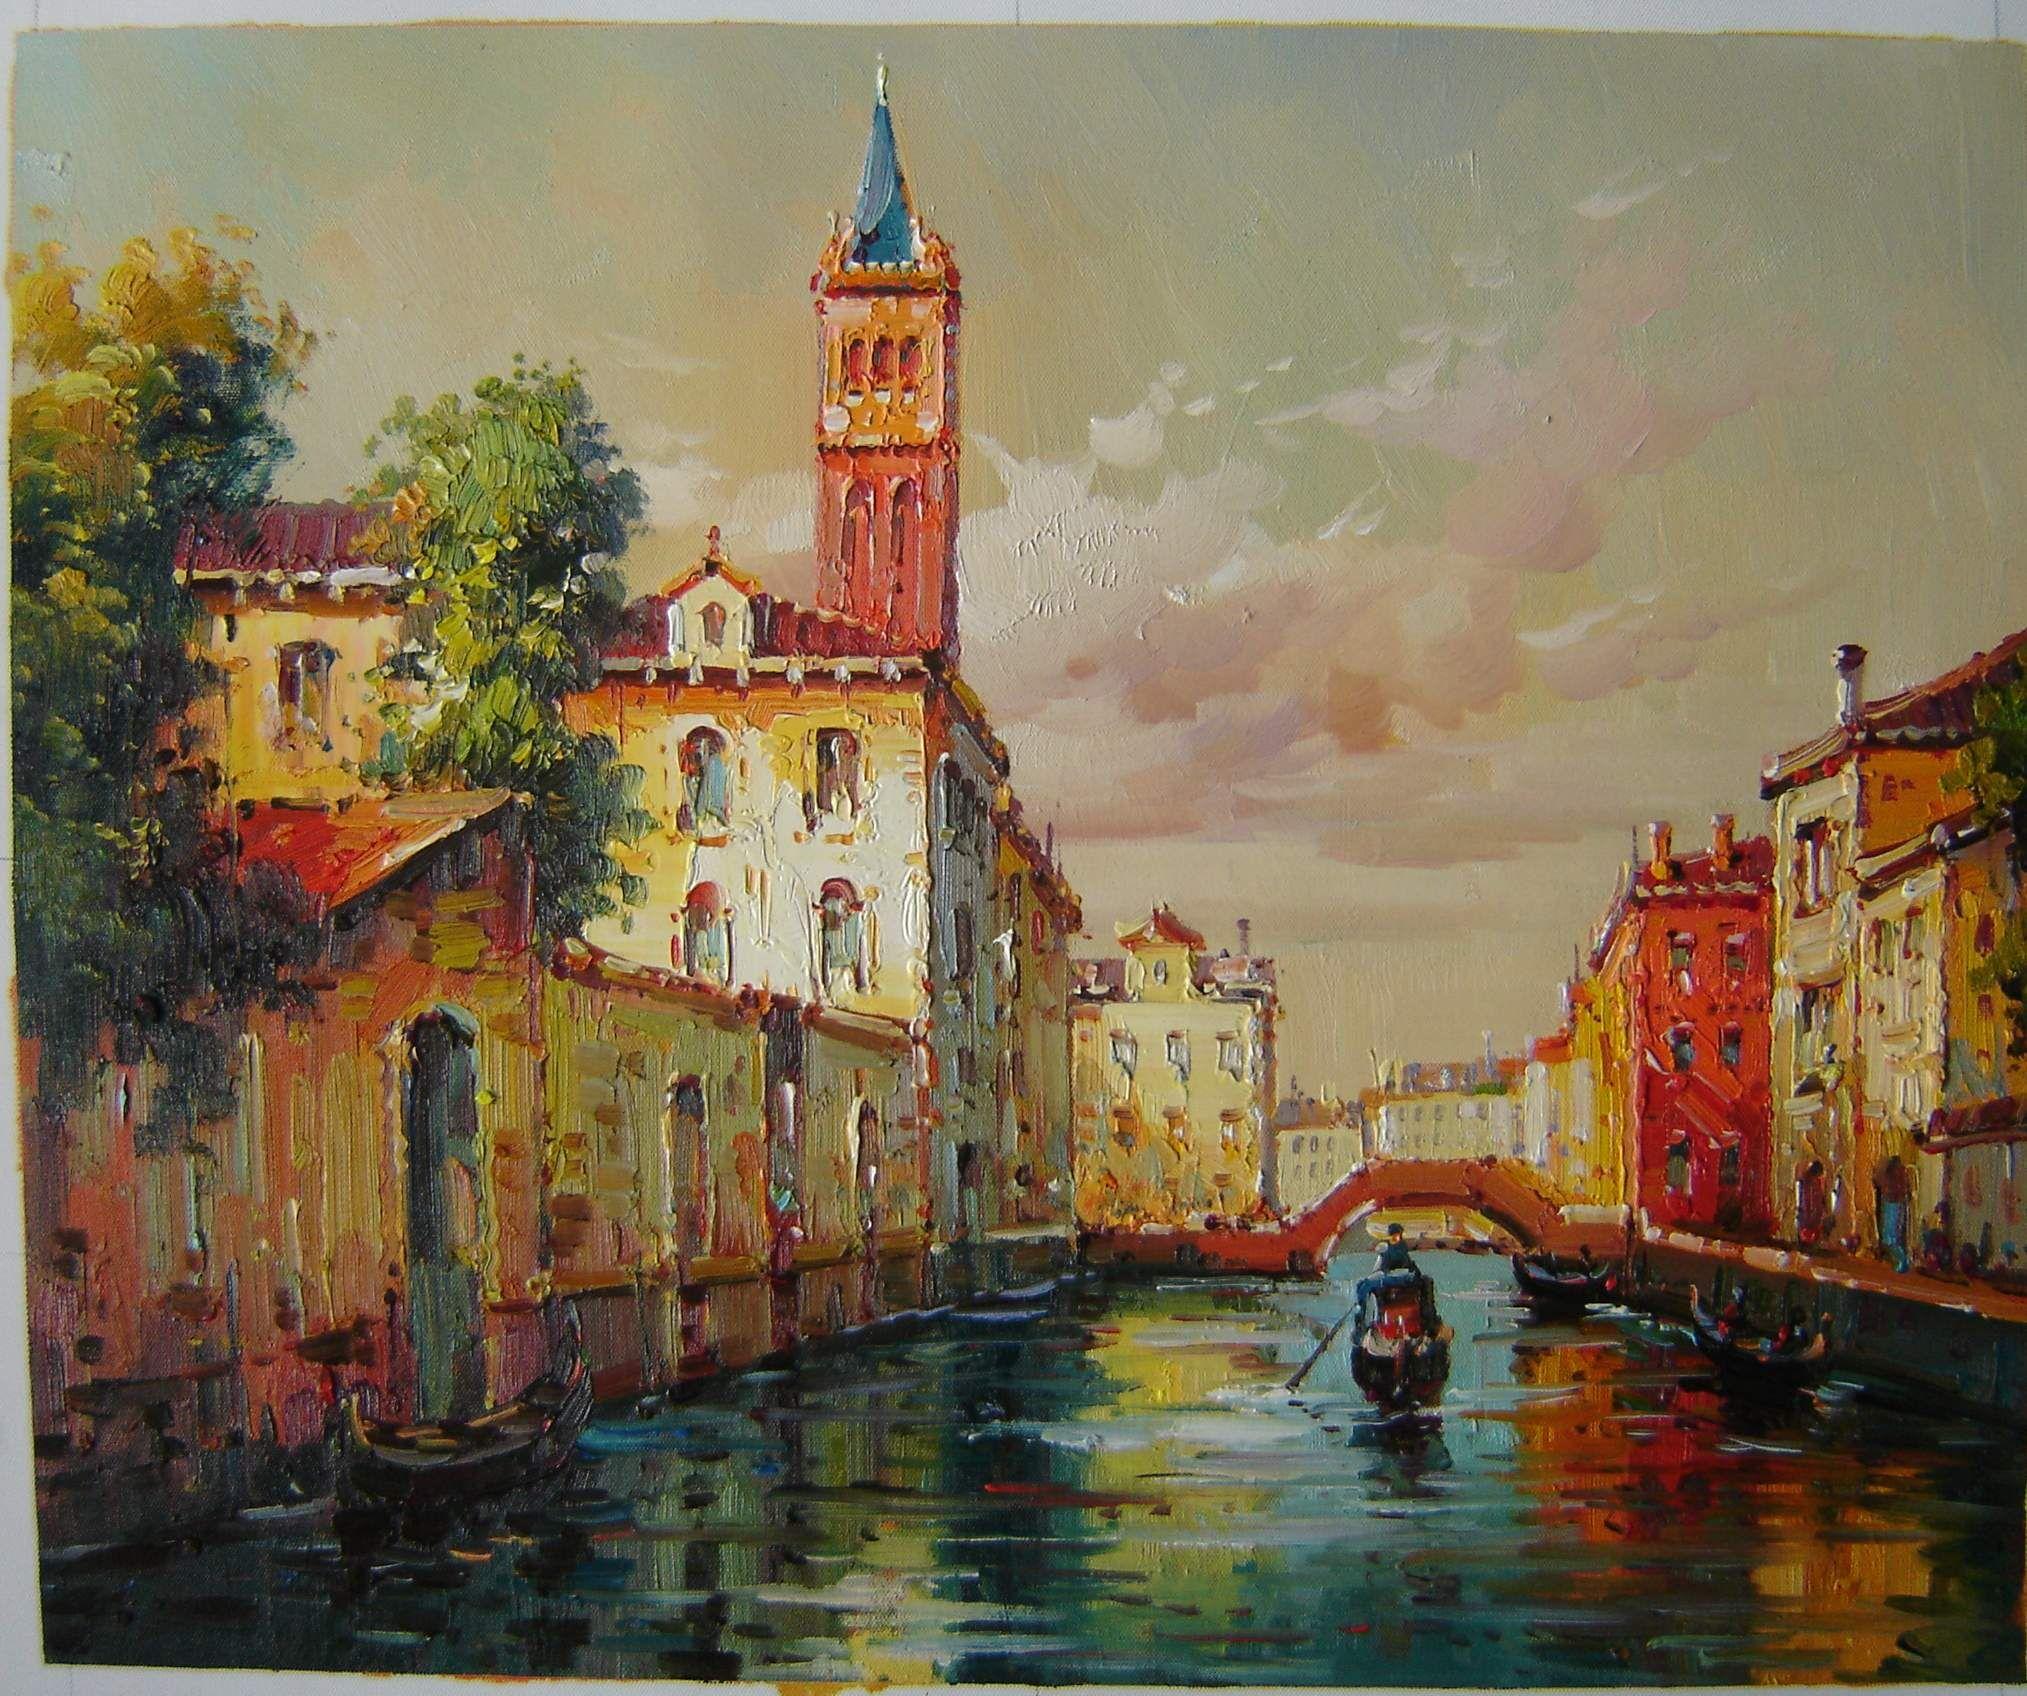 Acquista Impressione Vinice Pittura Ad Olio Vinice Paesaggio ...